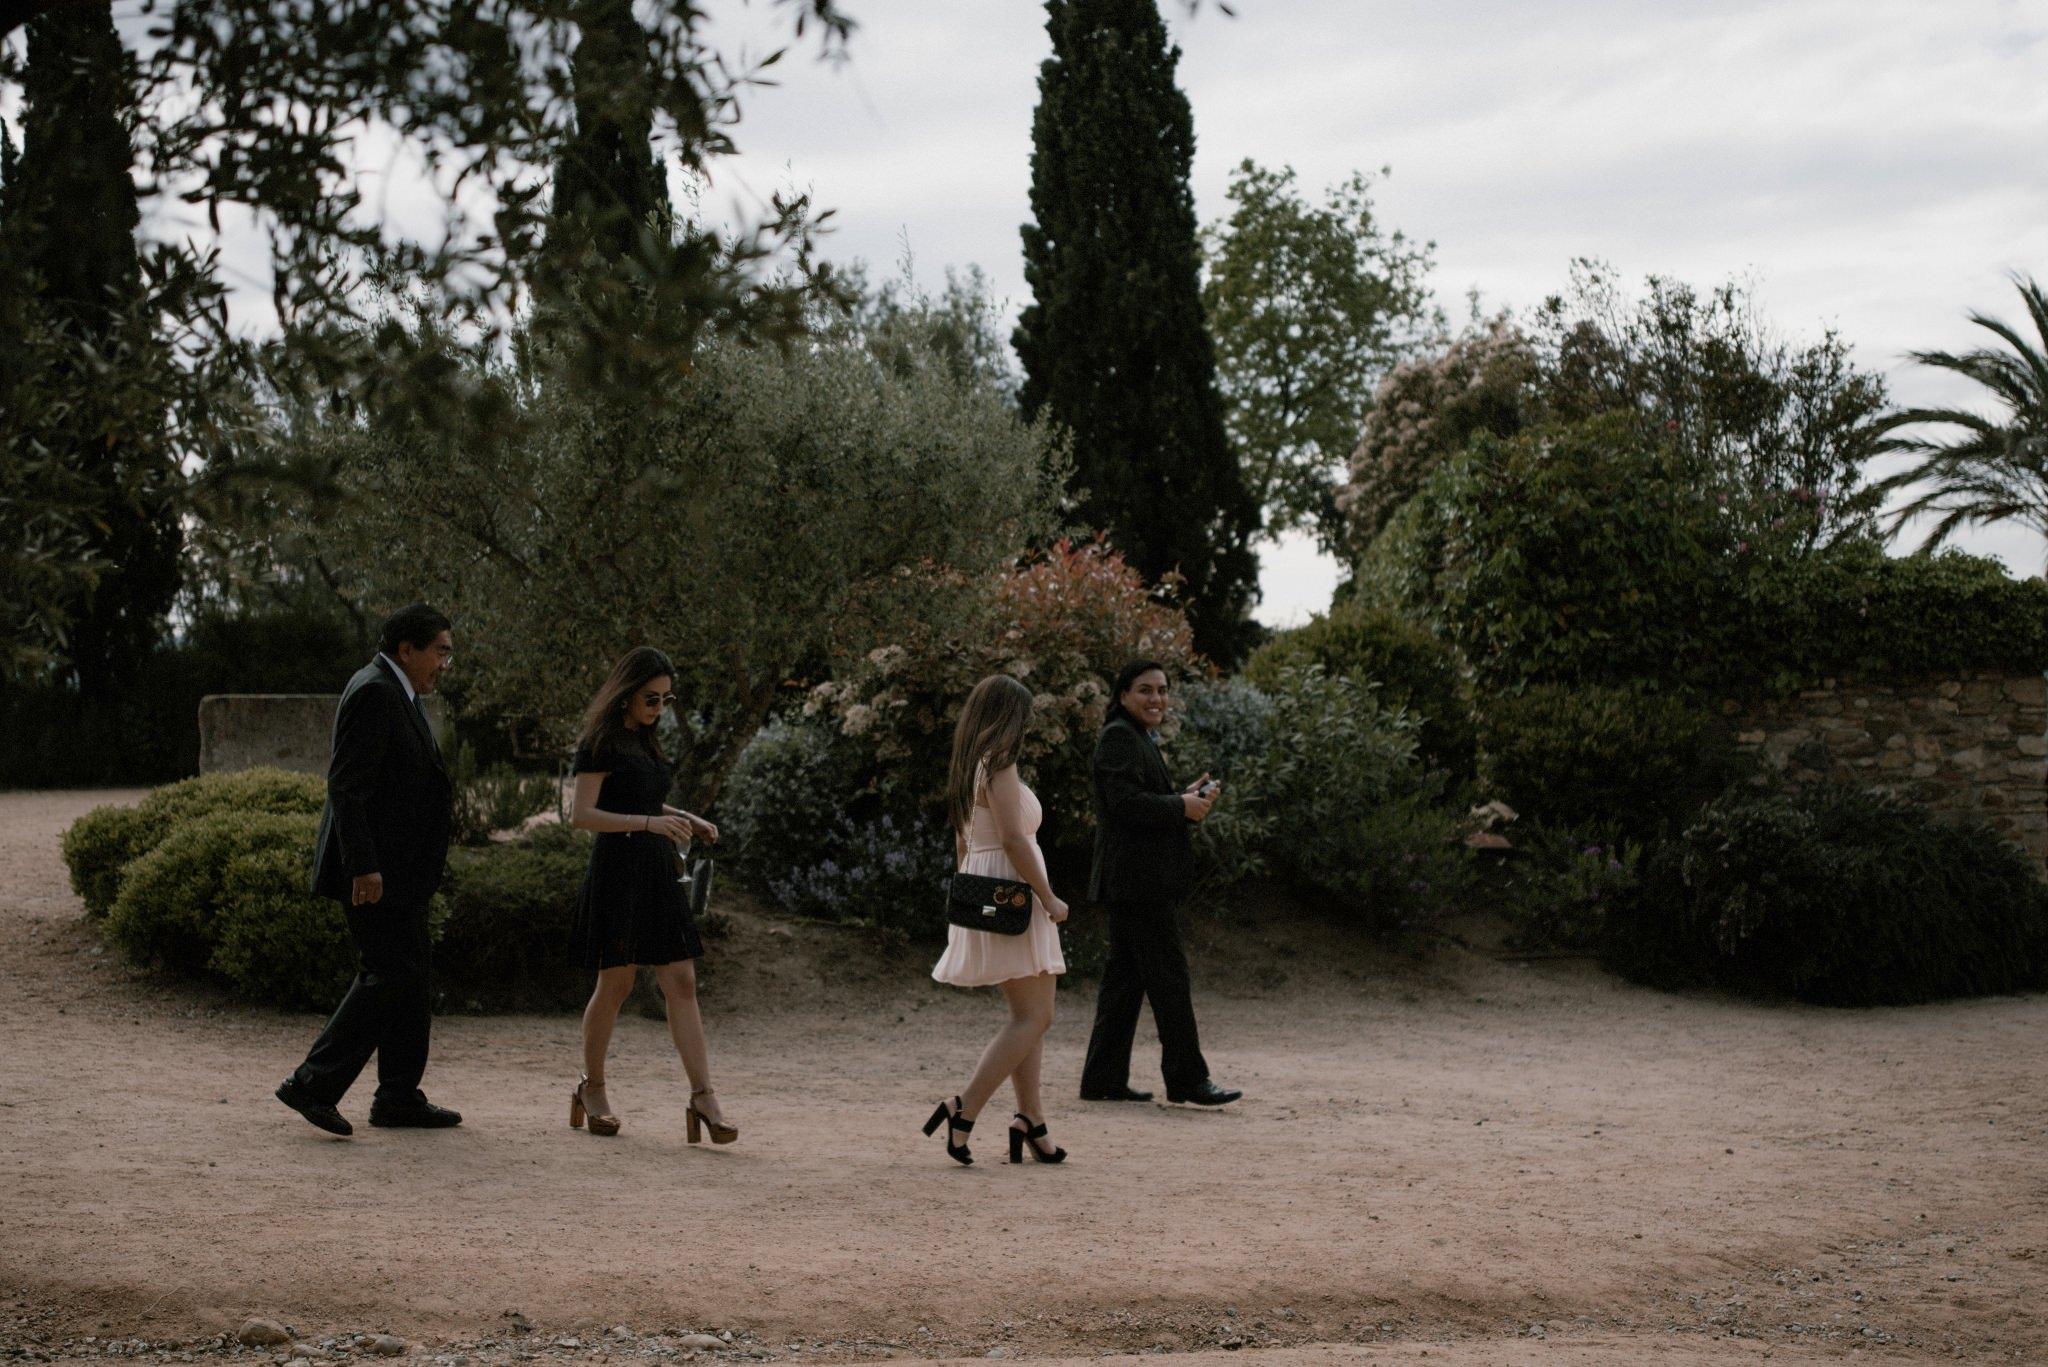 Bruidsfotograaf Spanje Castle d'Emporda destination wedding Naomi van der Kraan00044.jpg